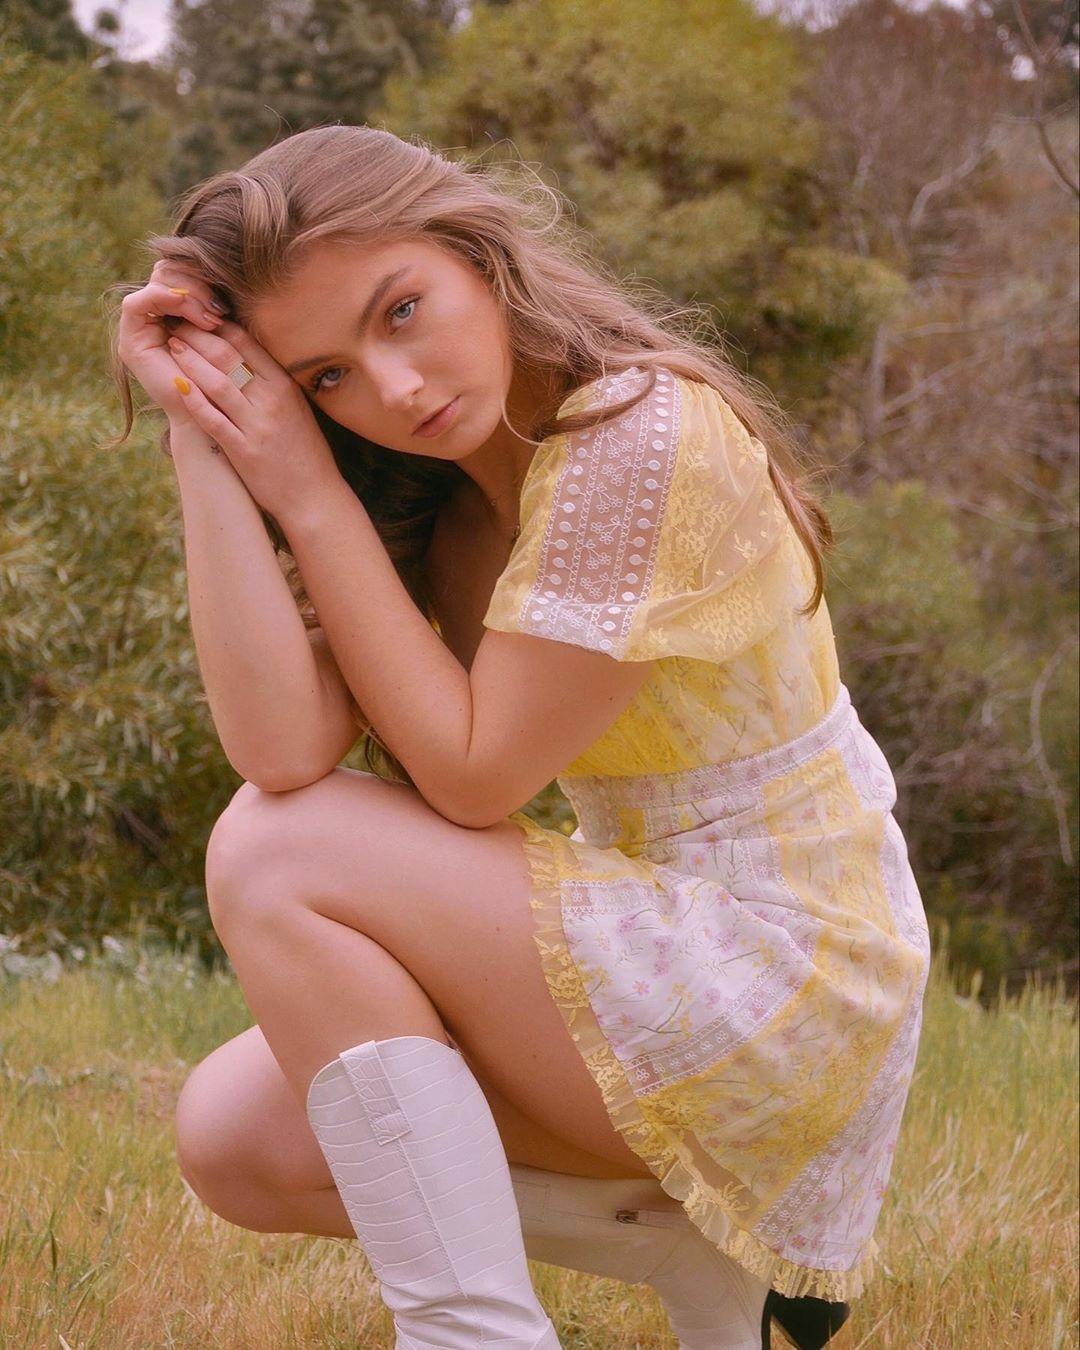 Amanda-Pavs-Wallpapers-Insta-Biography-9